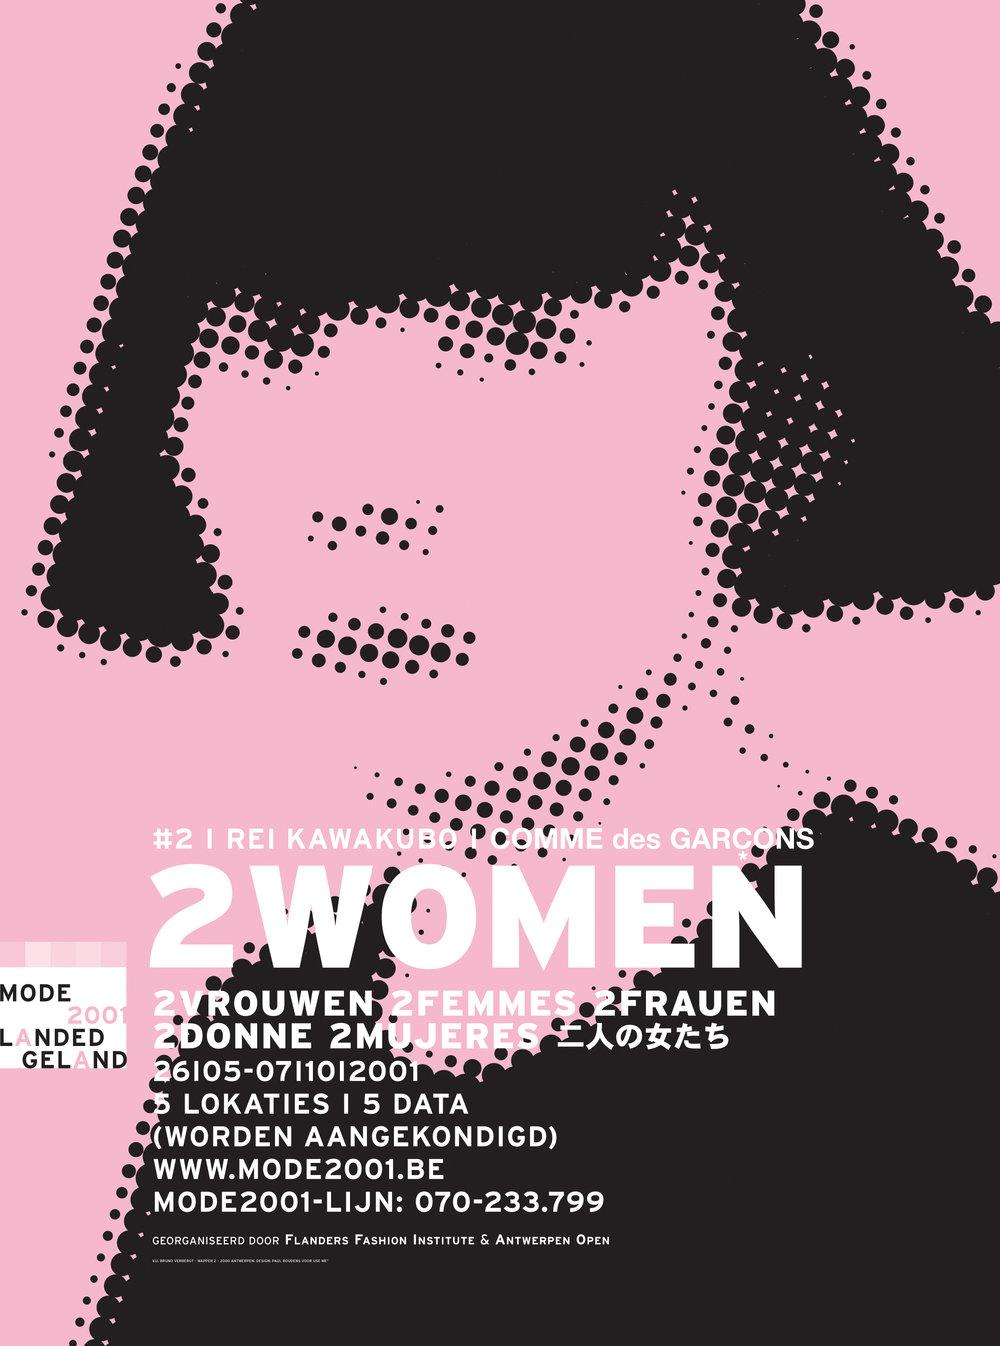 2001 Mode 2001 Kawakubo Poster.jpg